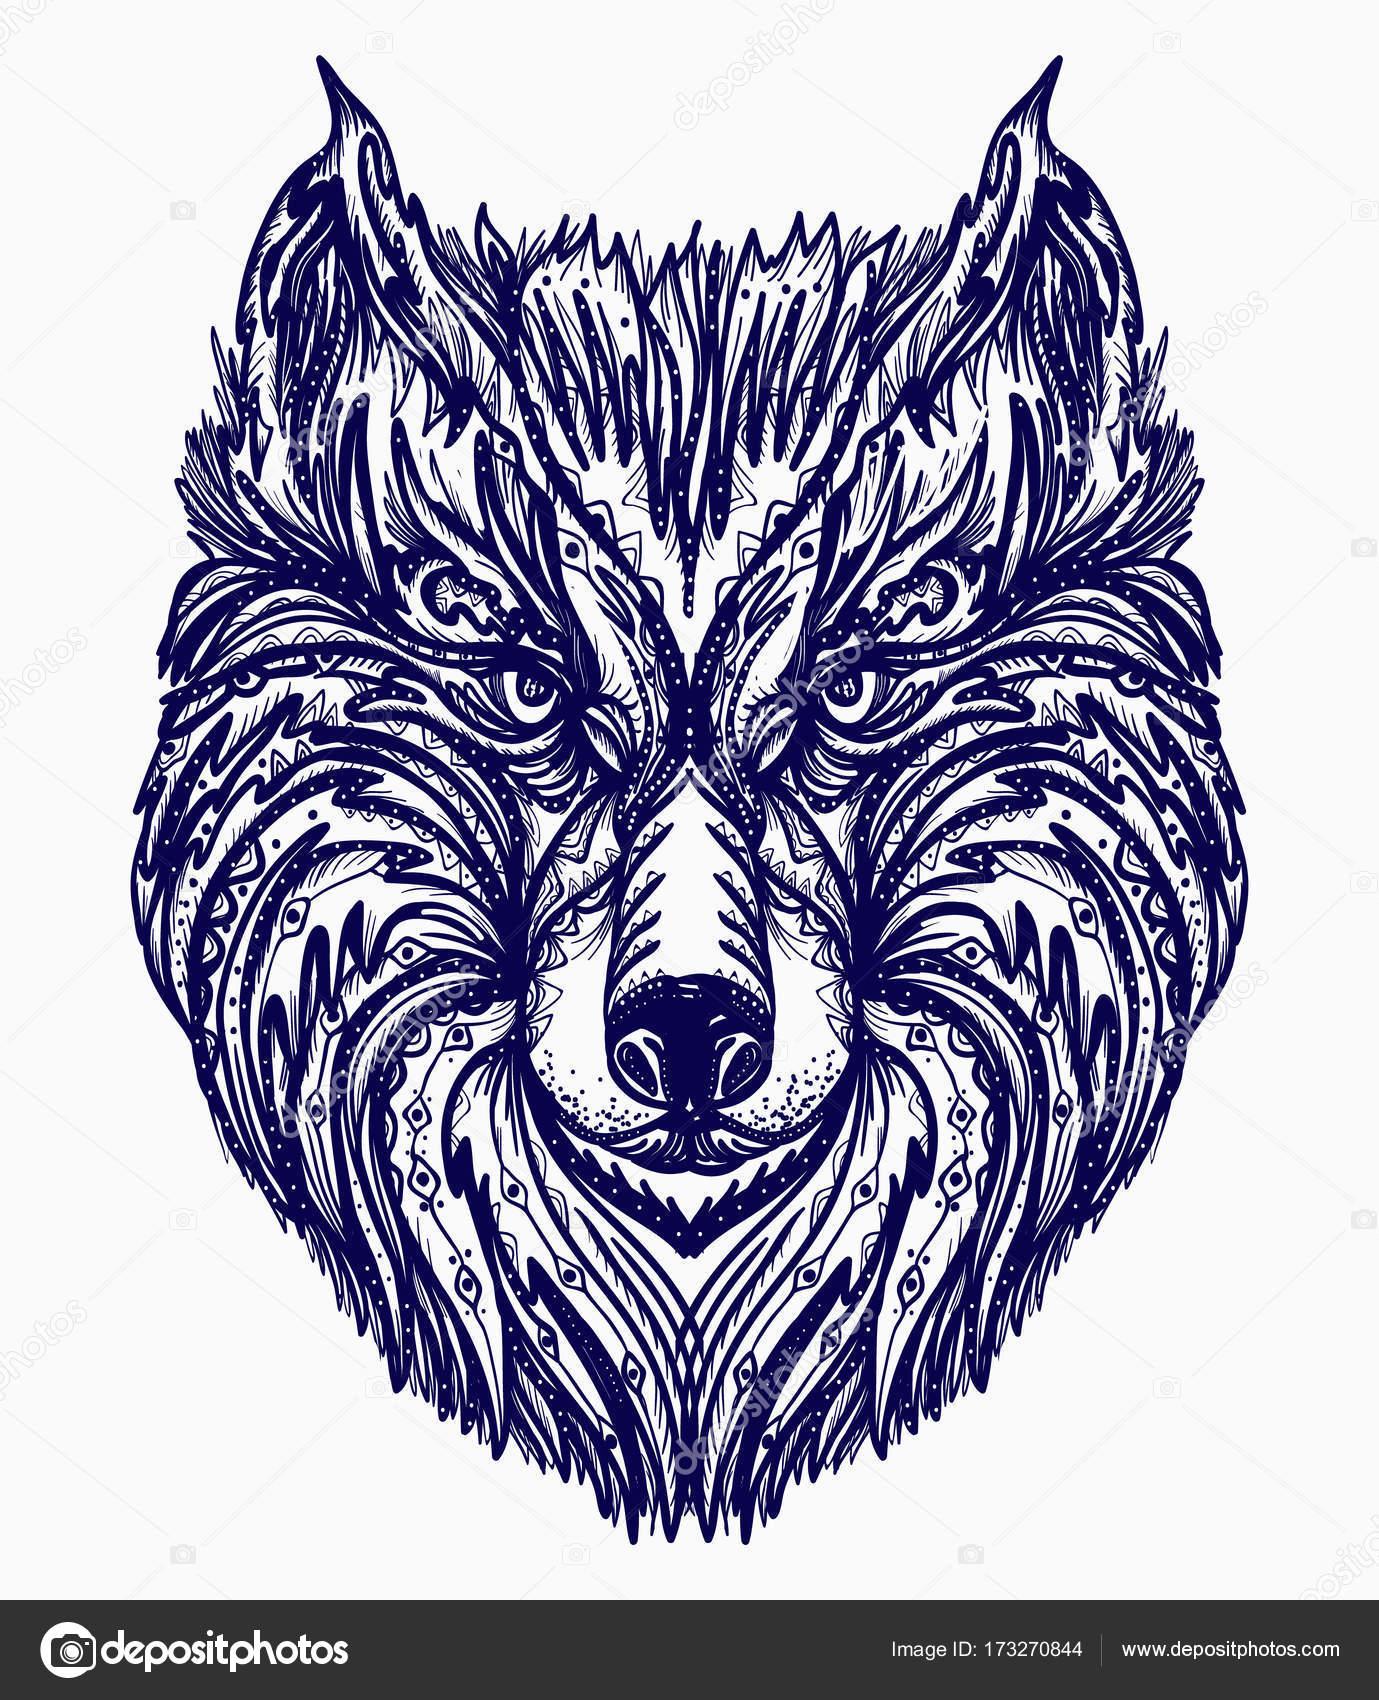 Tatuaż Wilk Native American Stylu T Shirt Głowa Wilka Grafika